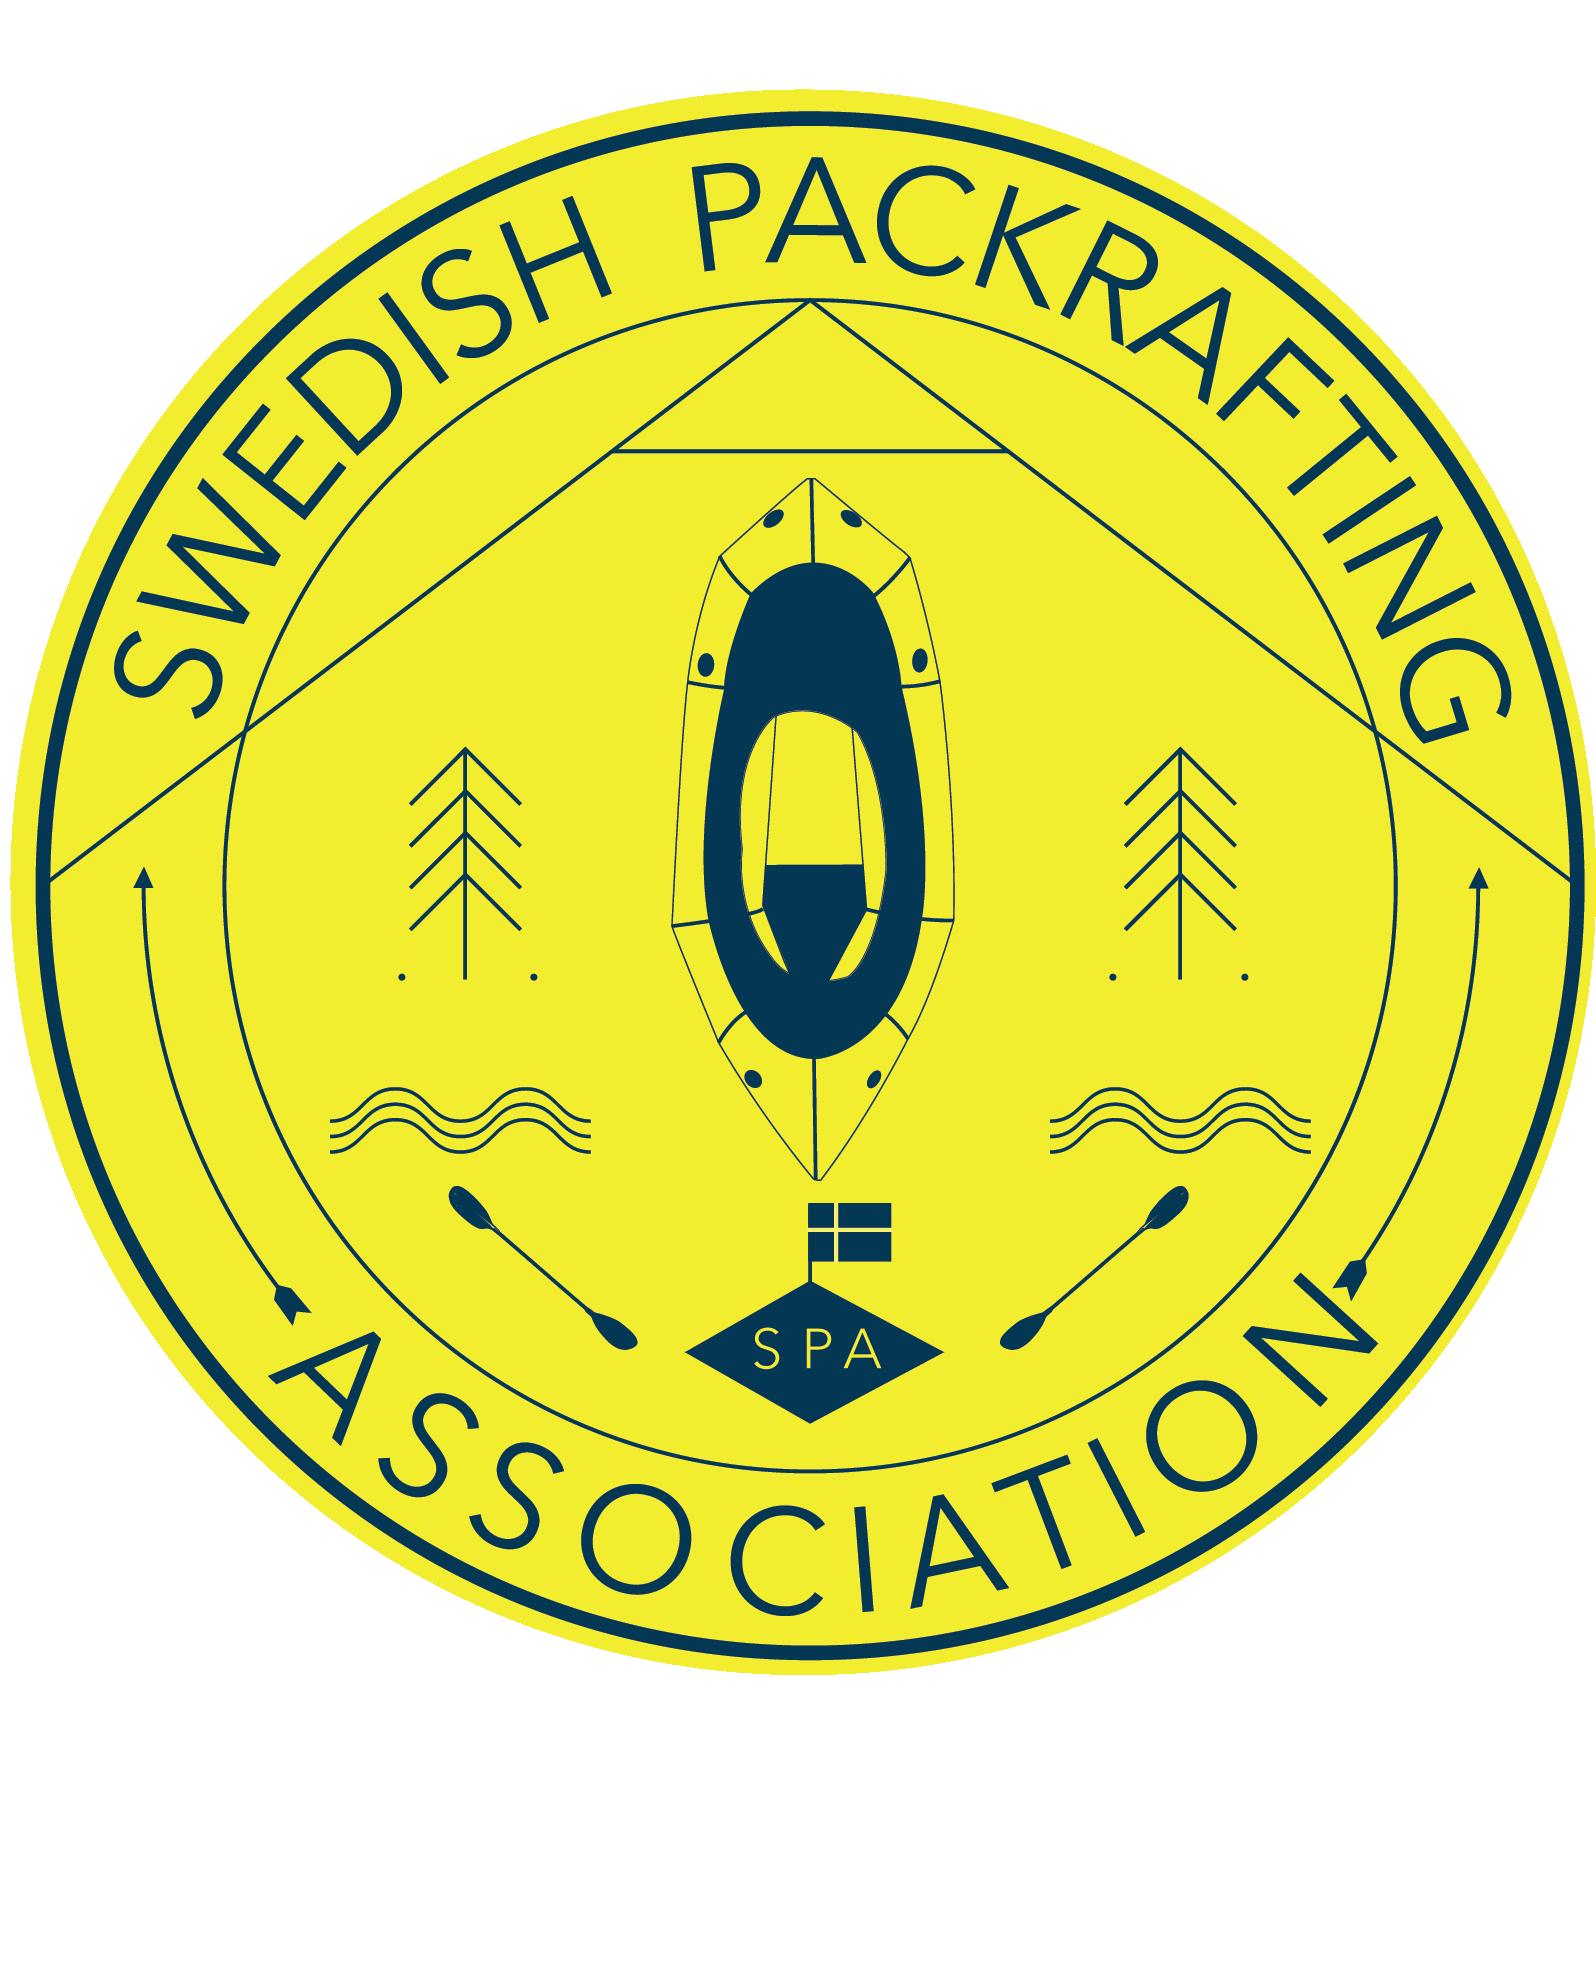 Swedish Packrafting Association